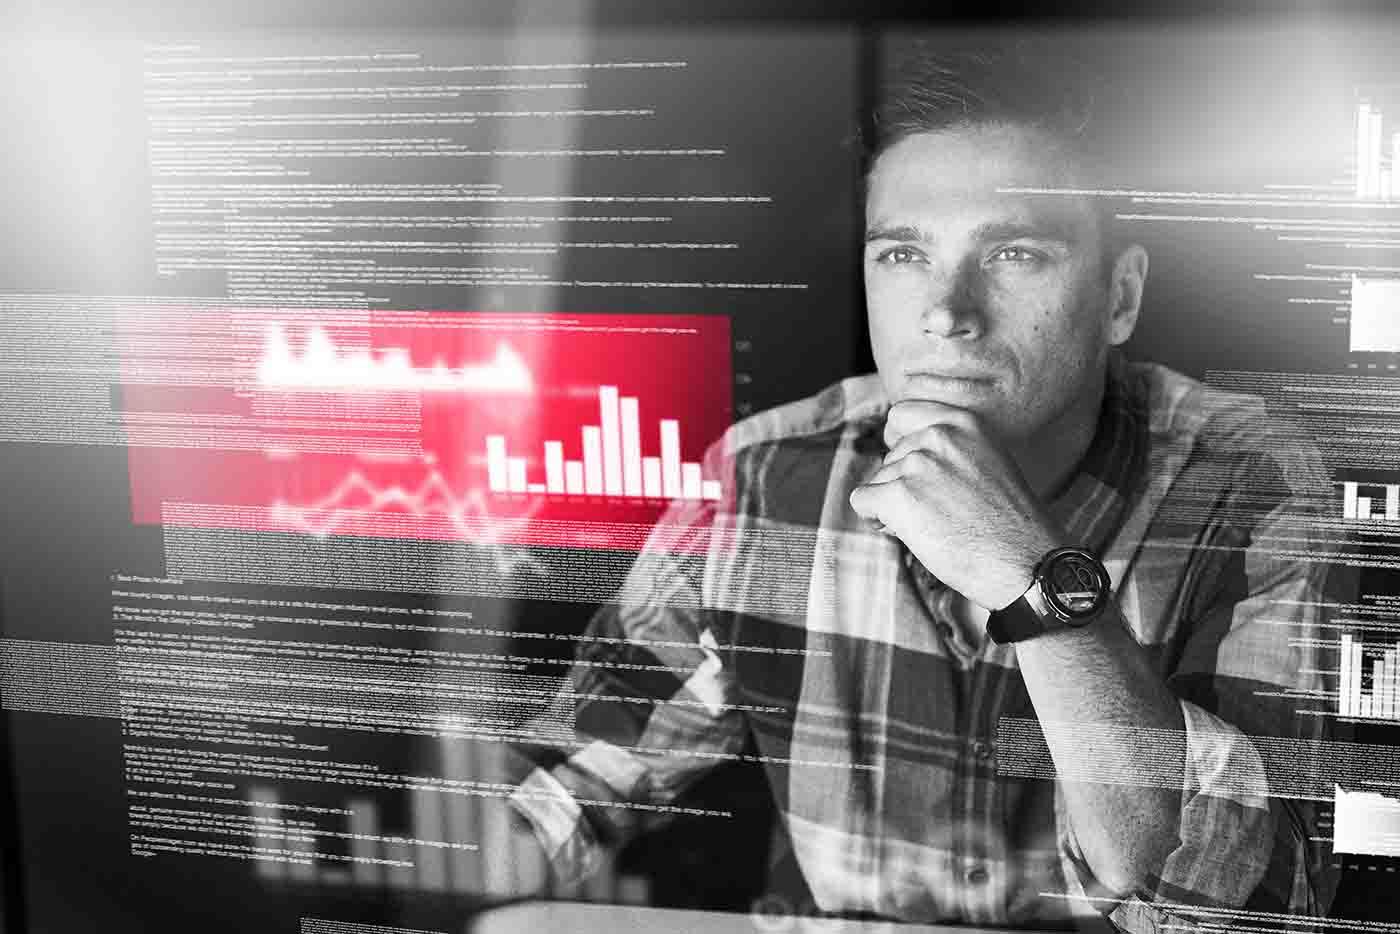 Guy looking at information on screen | Atradius